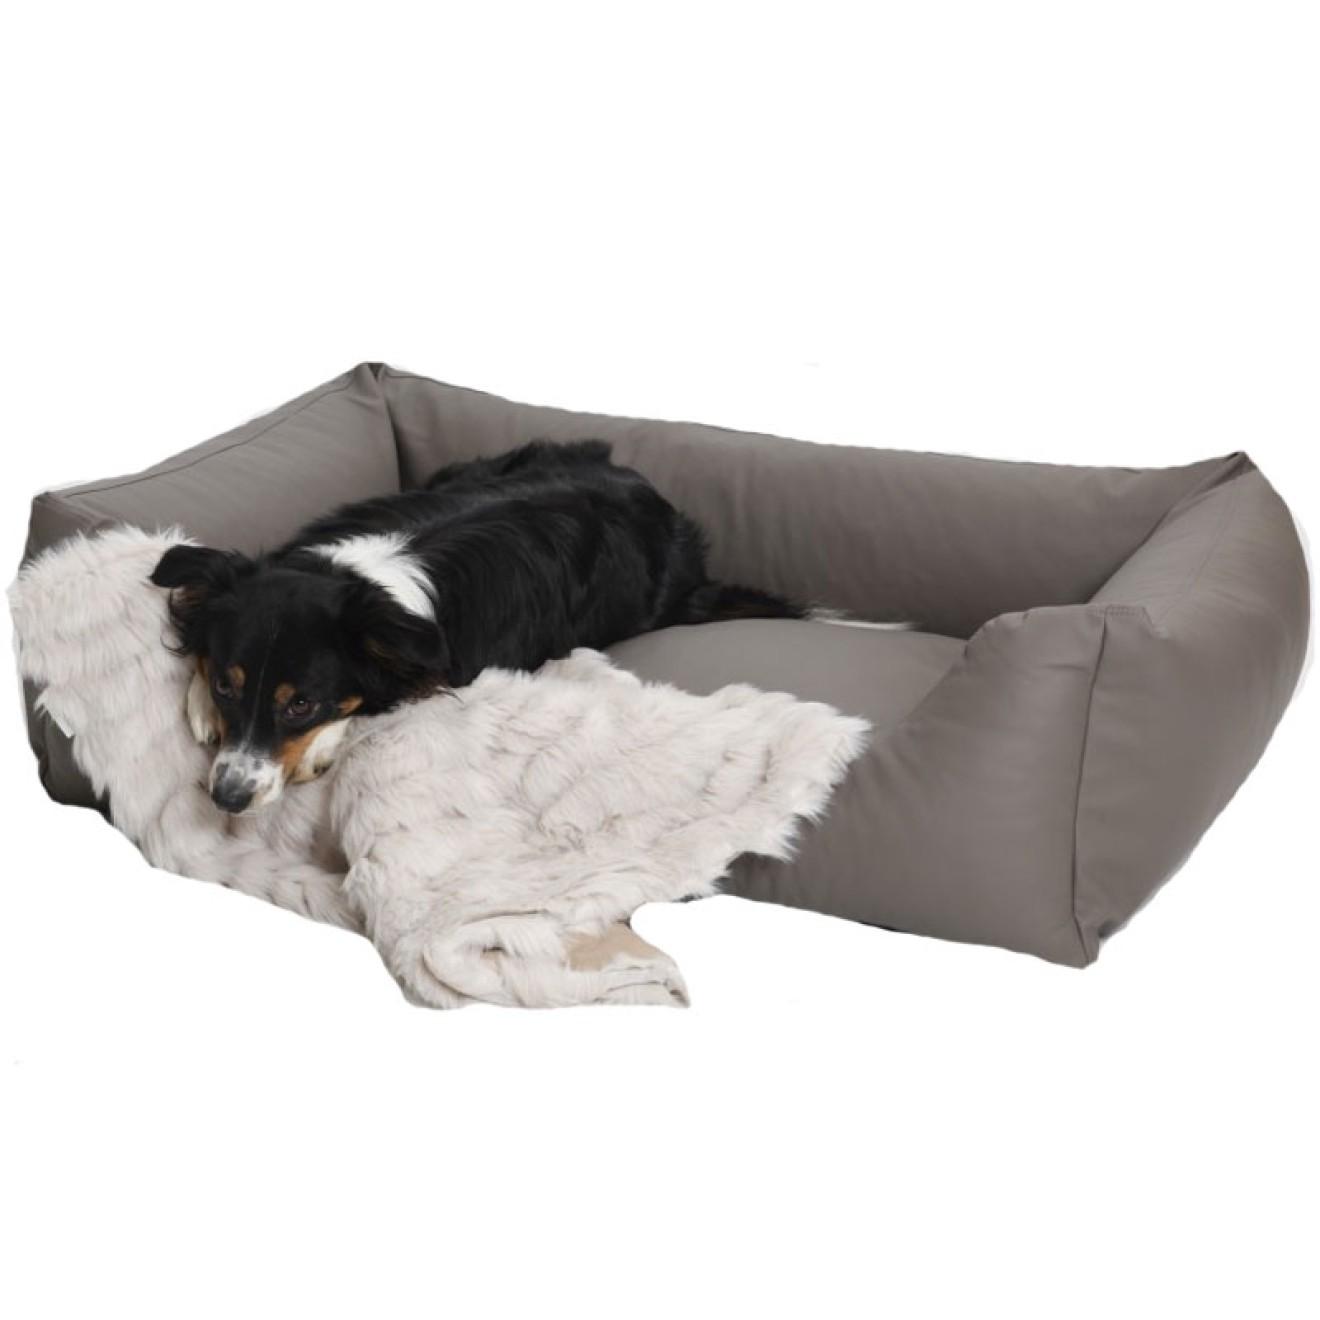 hundebett kunstleder taupe in 3 gr ssen hundebett. Black Bedroom Furniture Sets. Home Design Ideas